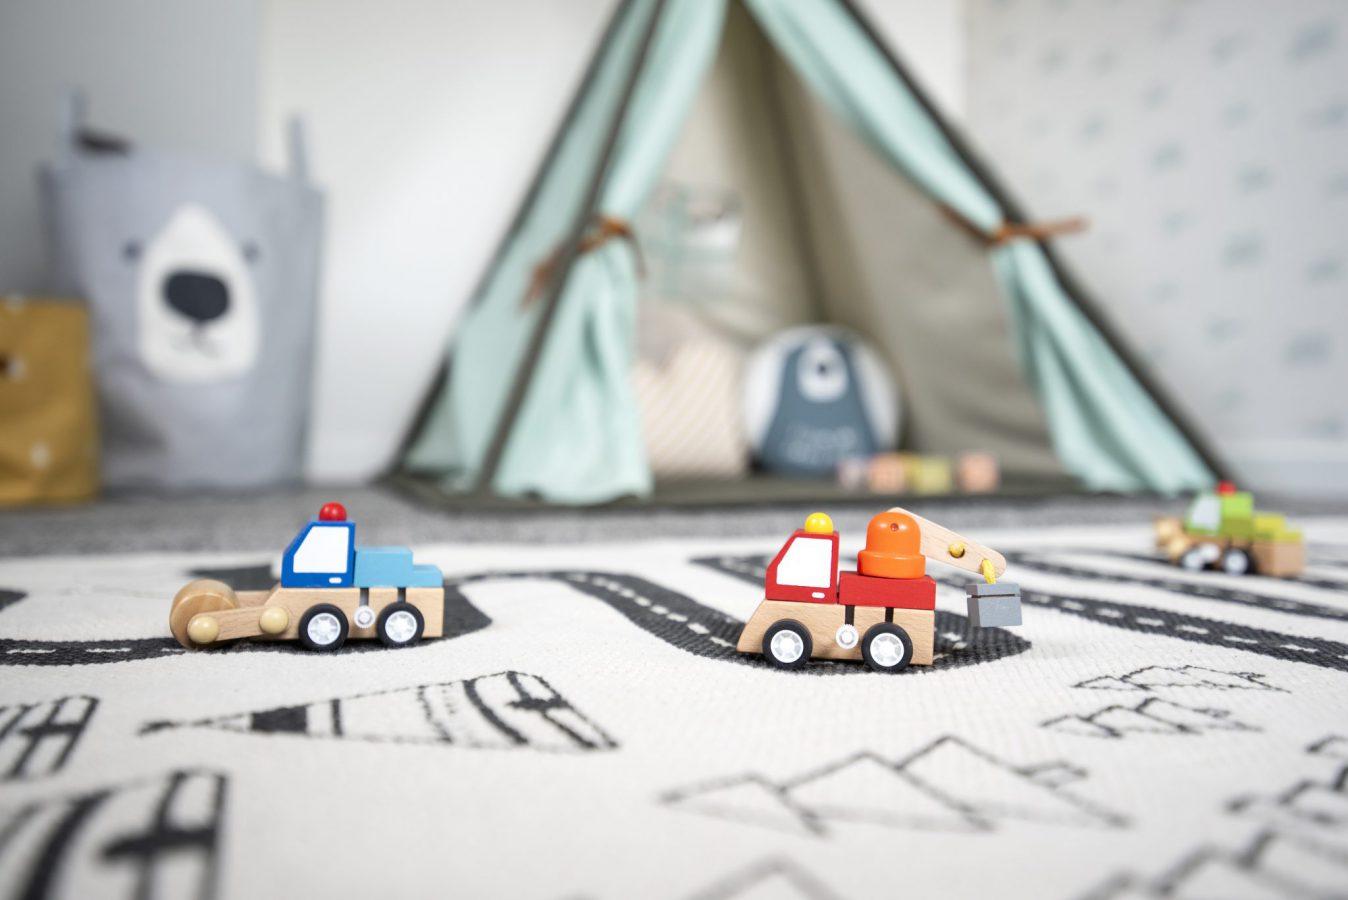 Kinderkamer jongenskamer interieuradvies styling interieurontwerp Hedel Den Bosch